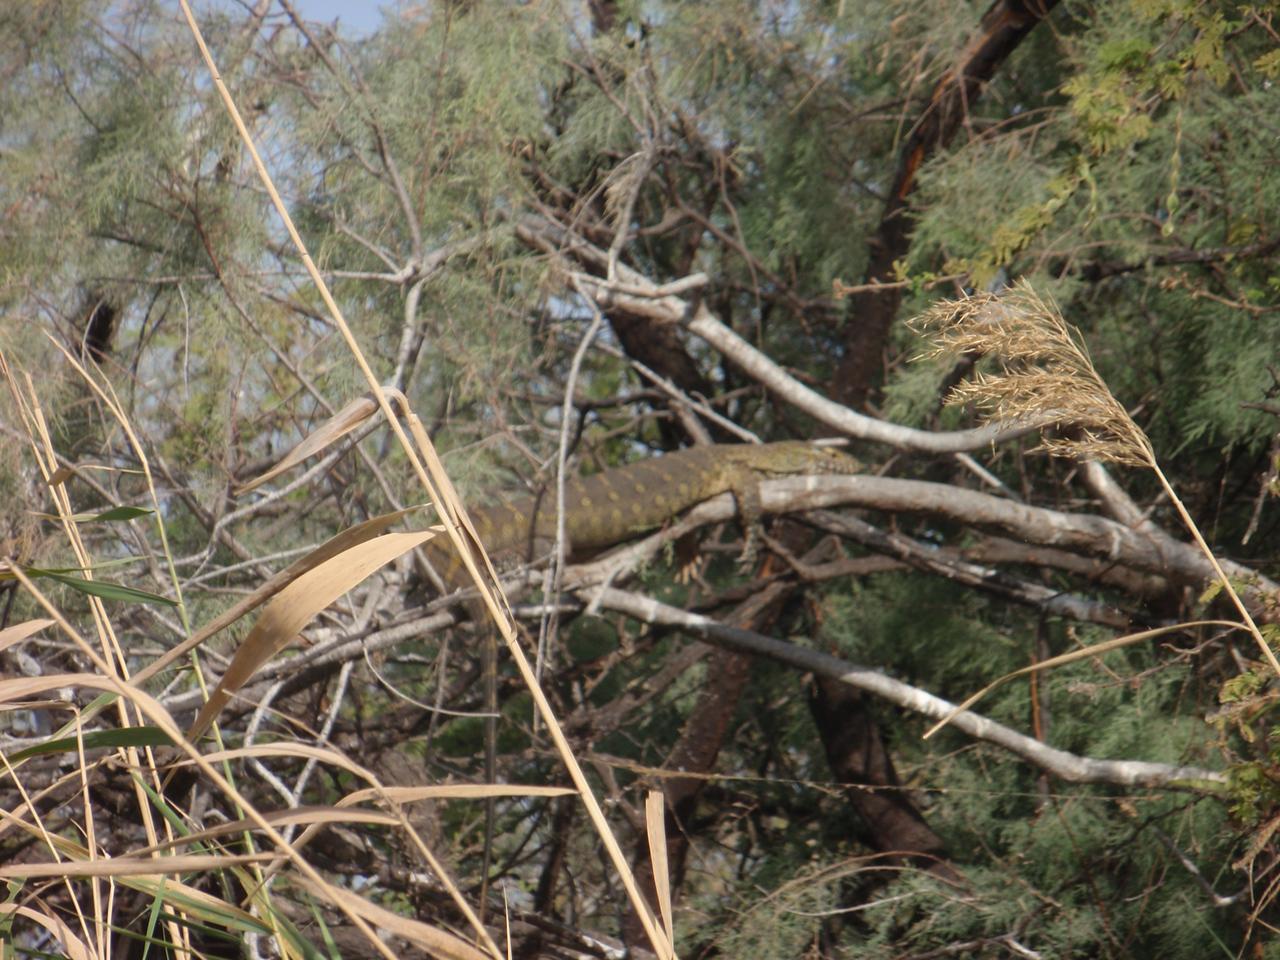 130_Djoudj National Bird Park  A Big Iguana